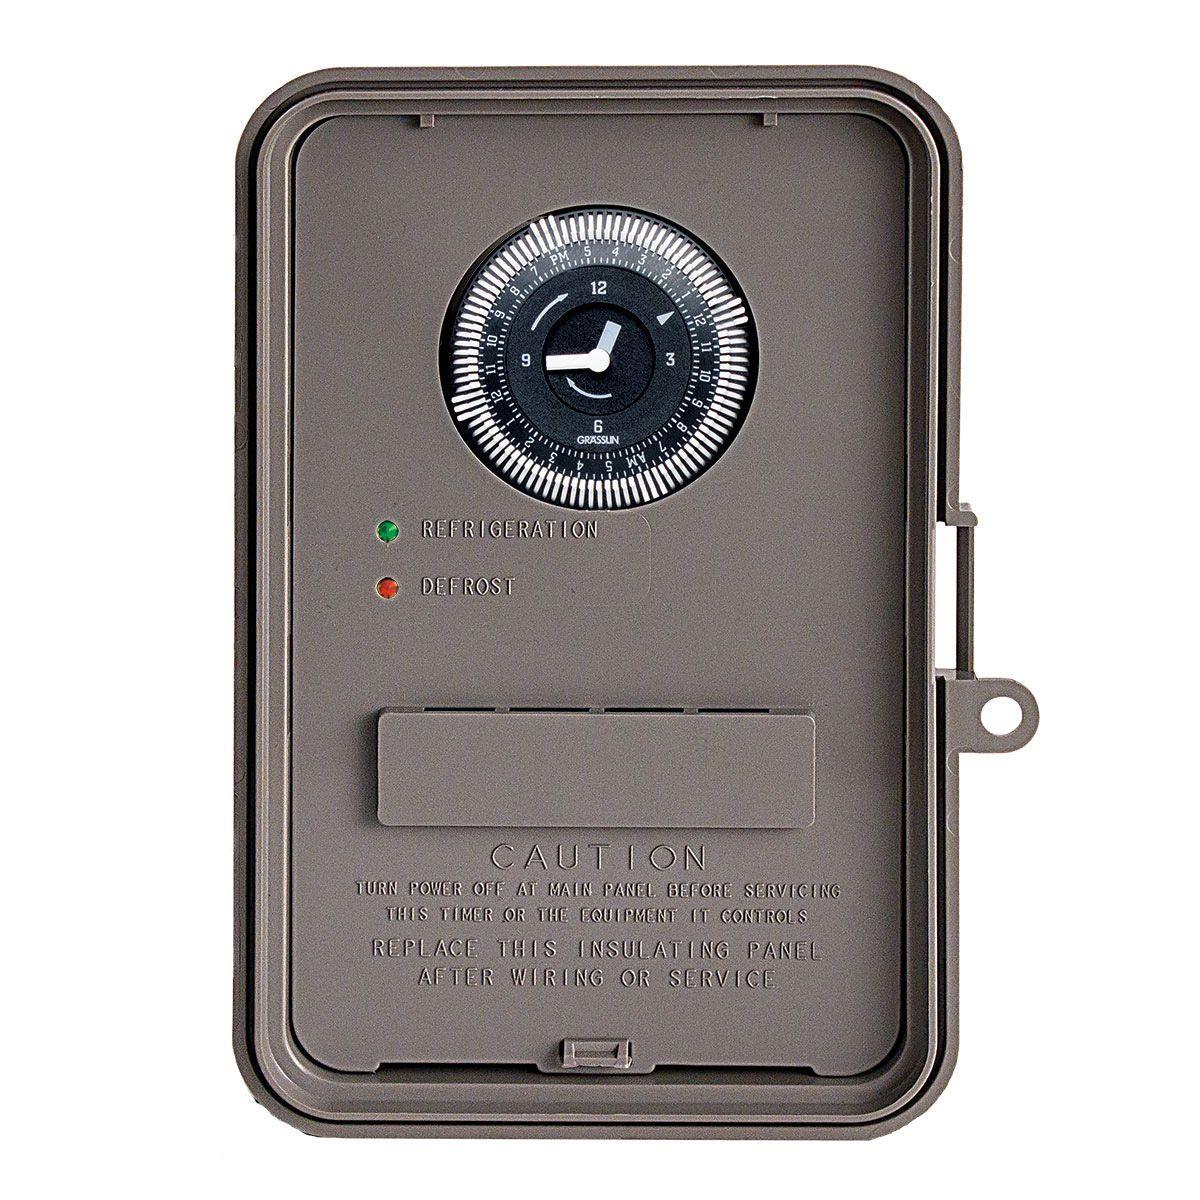 hight resolution of grasslin dtav40 auto voltage defrost timer 120 240vac heatcraft